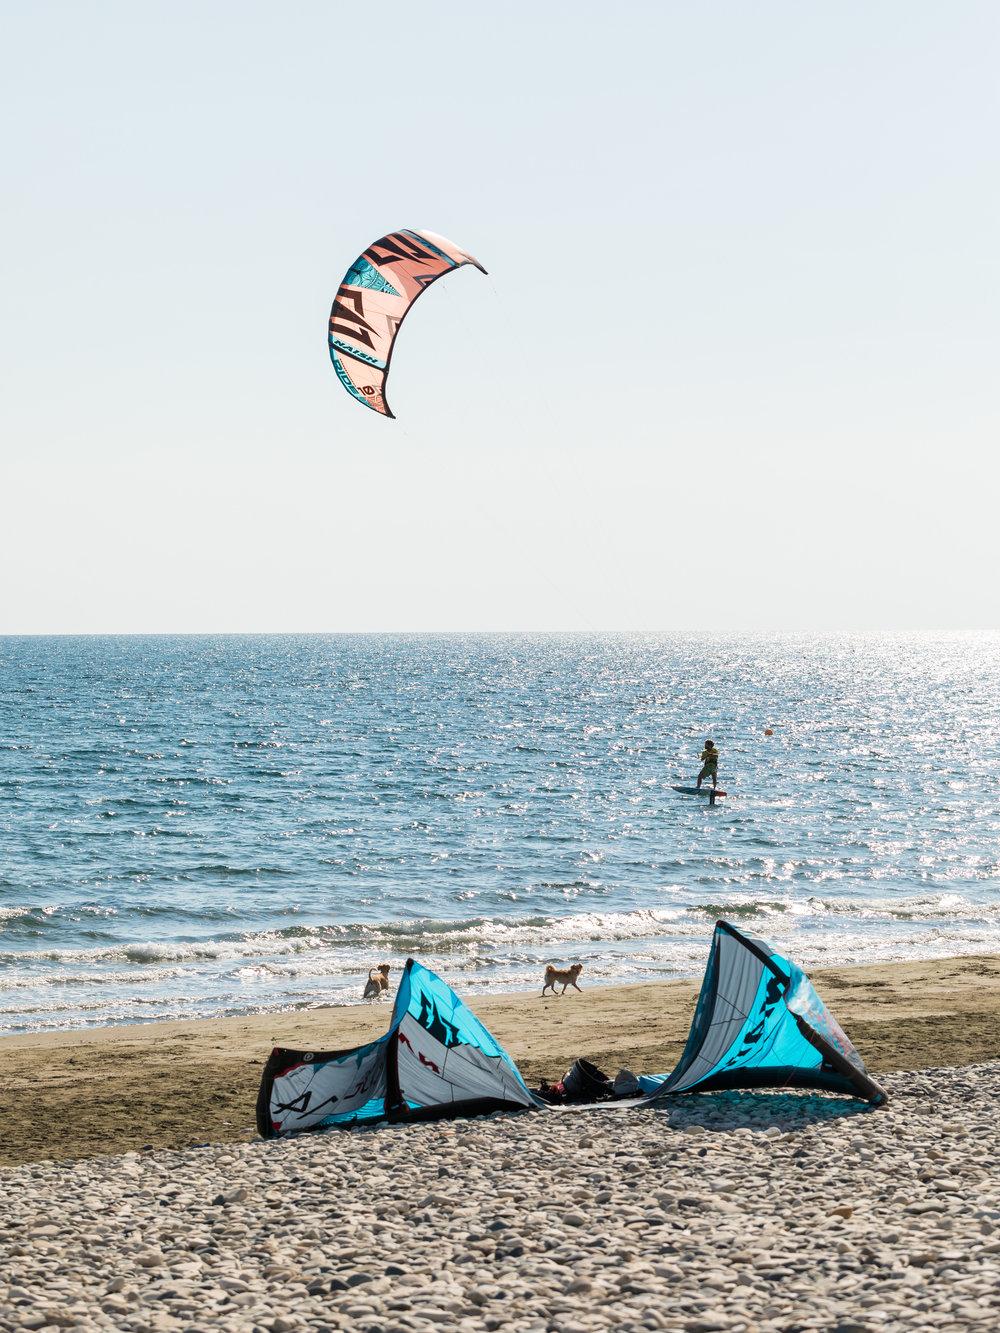 BenReadPhotography_TUI_Cyprus_Kiteboarding-24.jpg